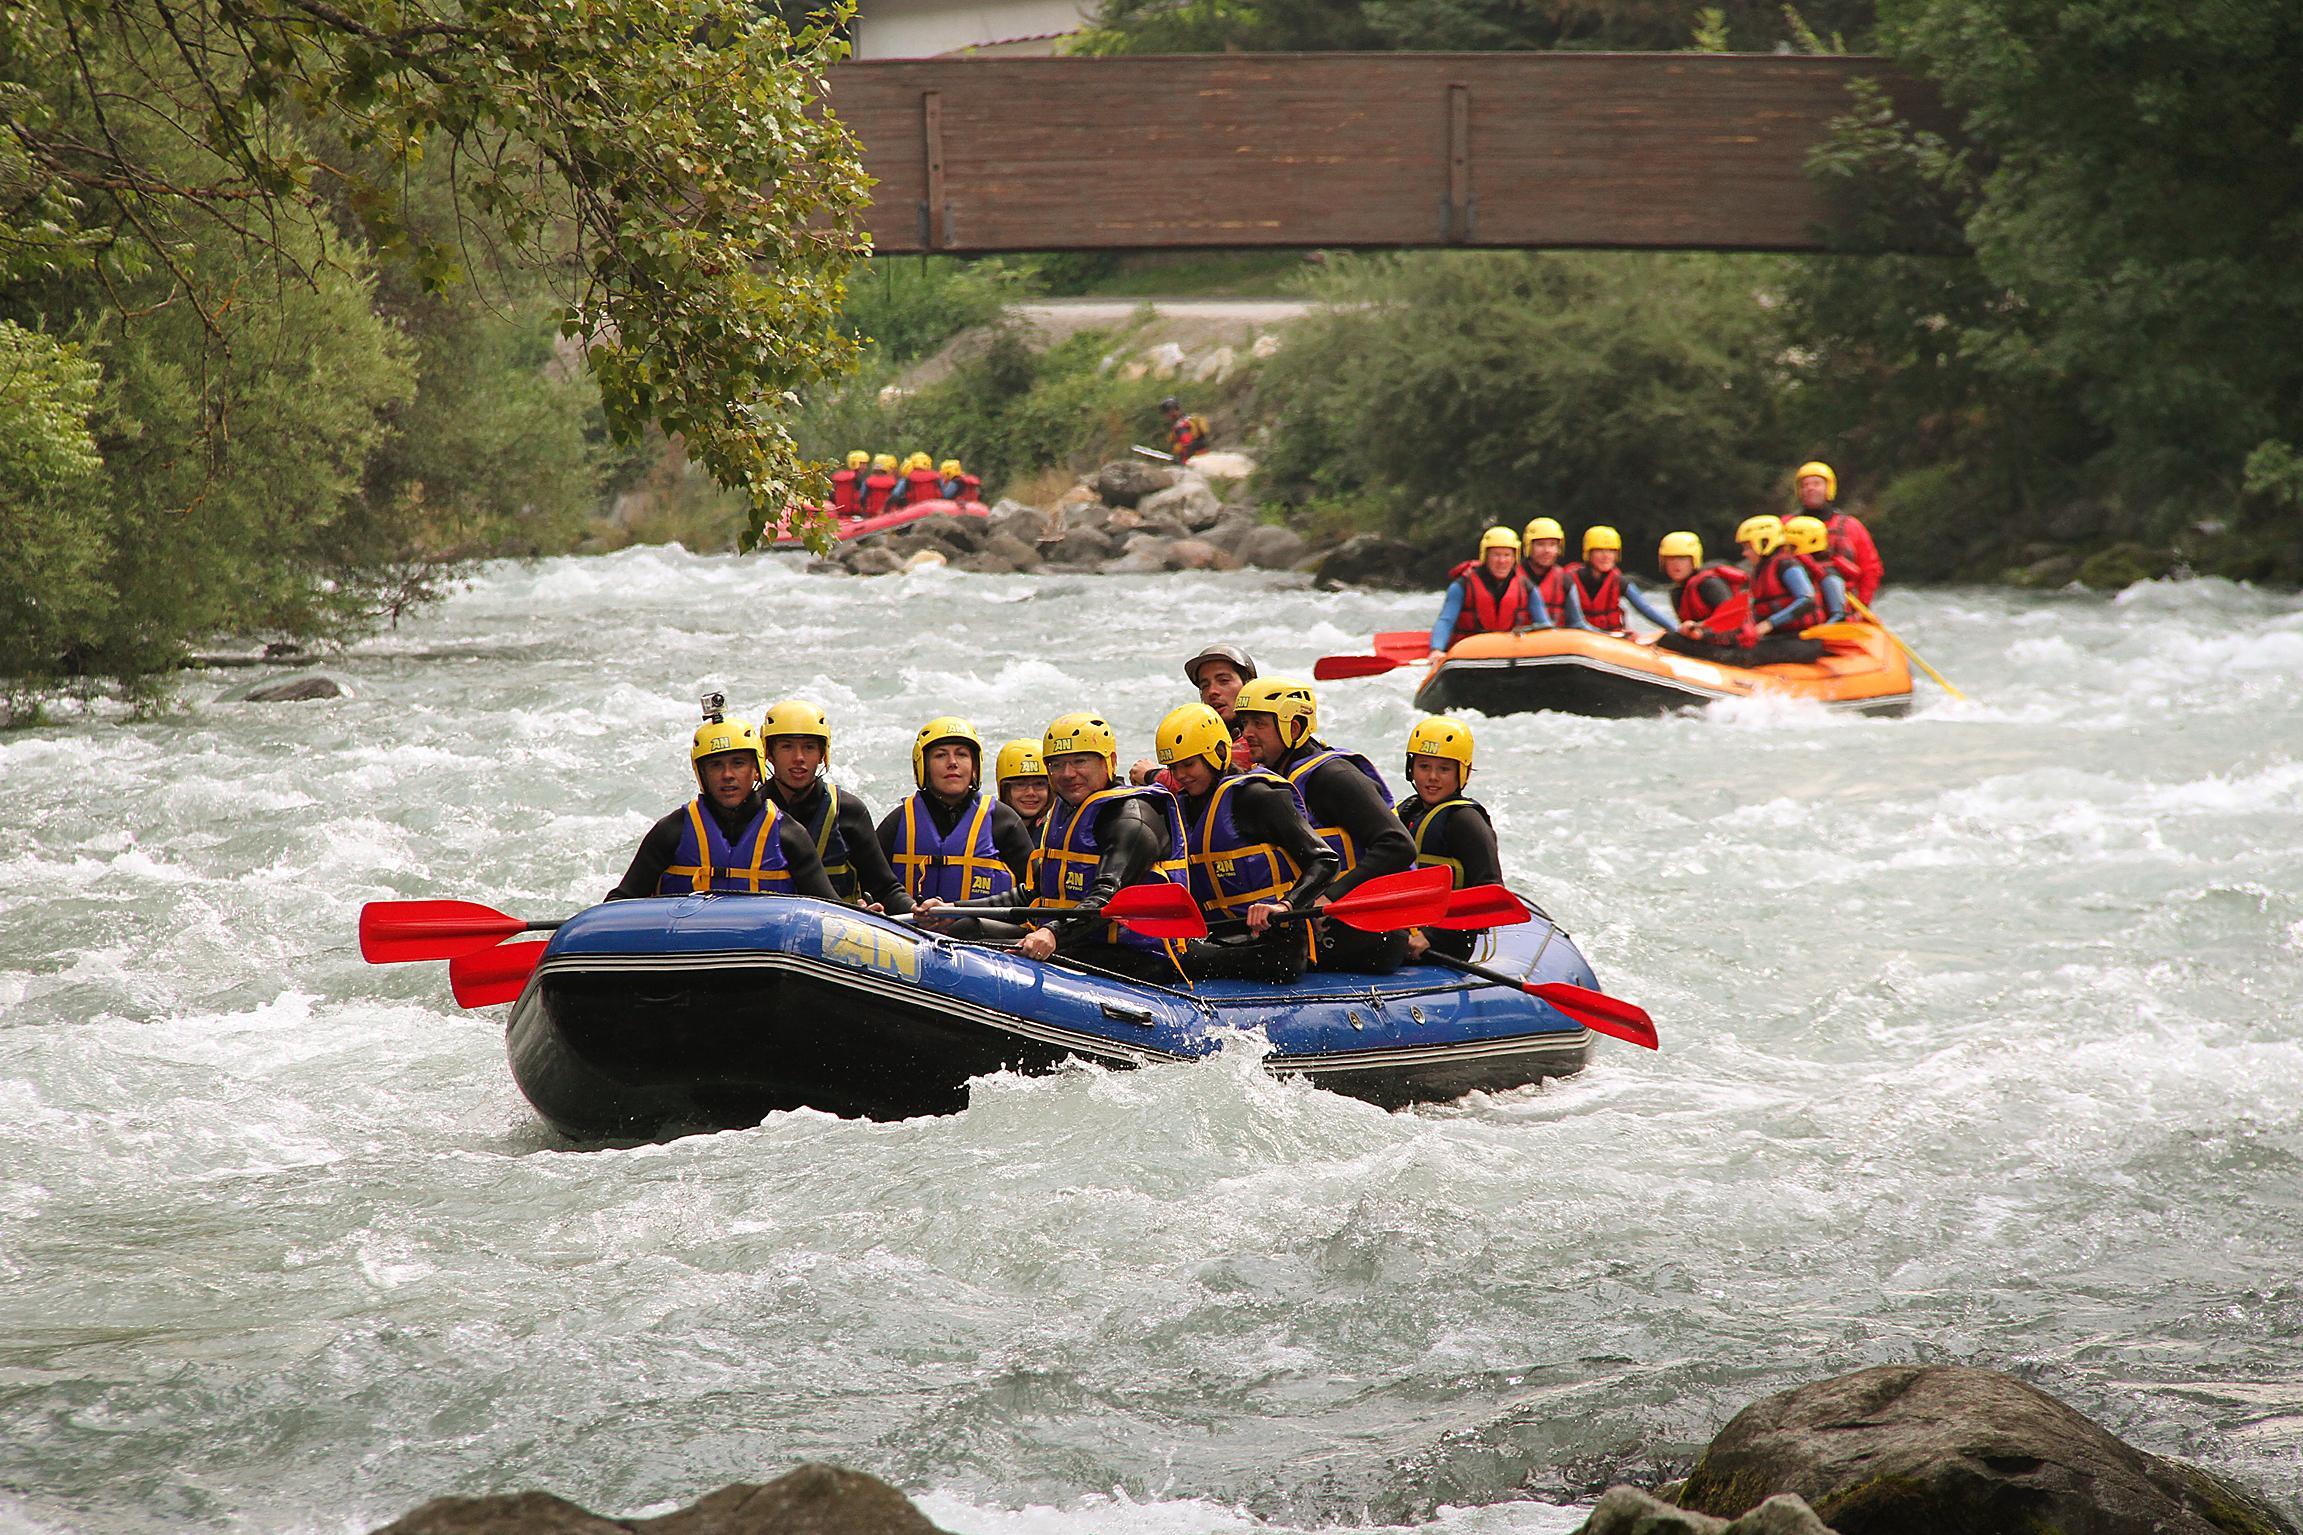 Séminaire Descente Rafting